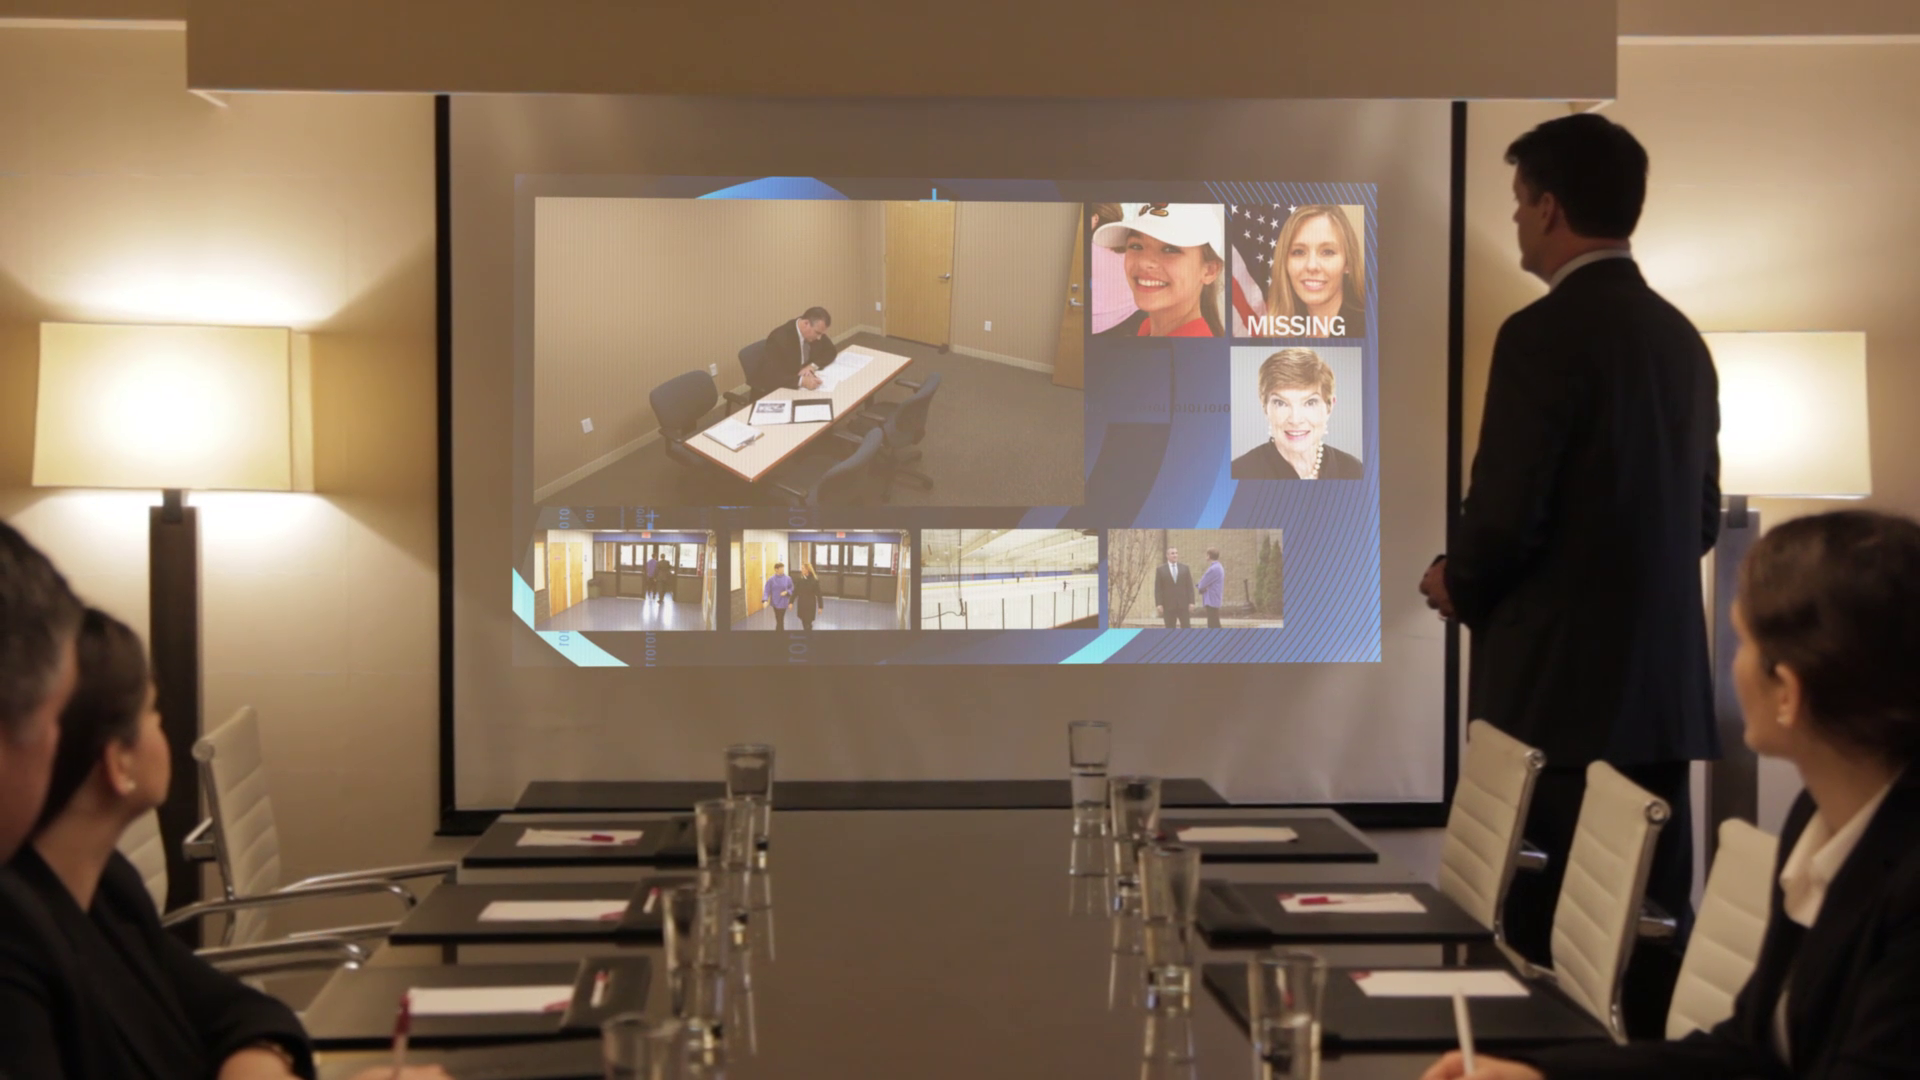 FBI Conference Room-Serpentine